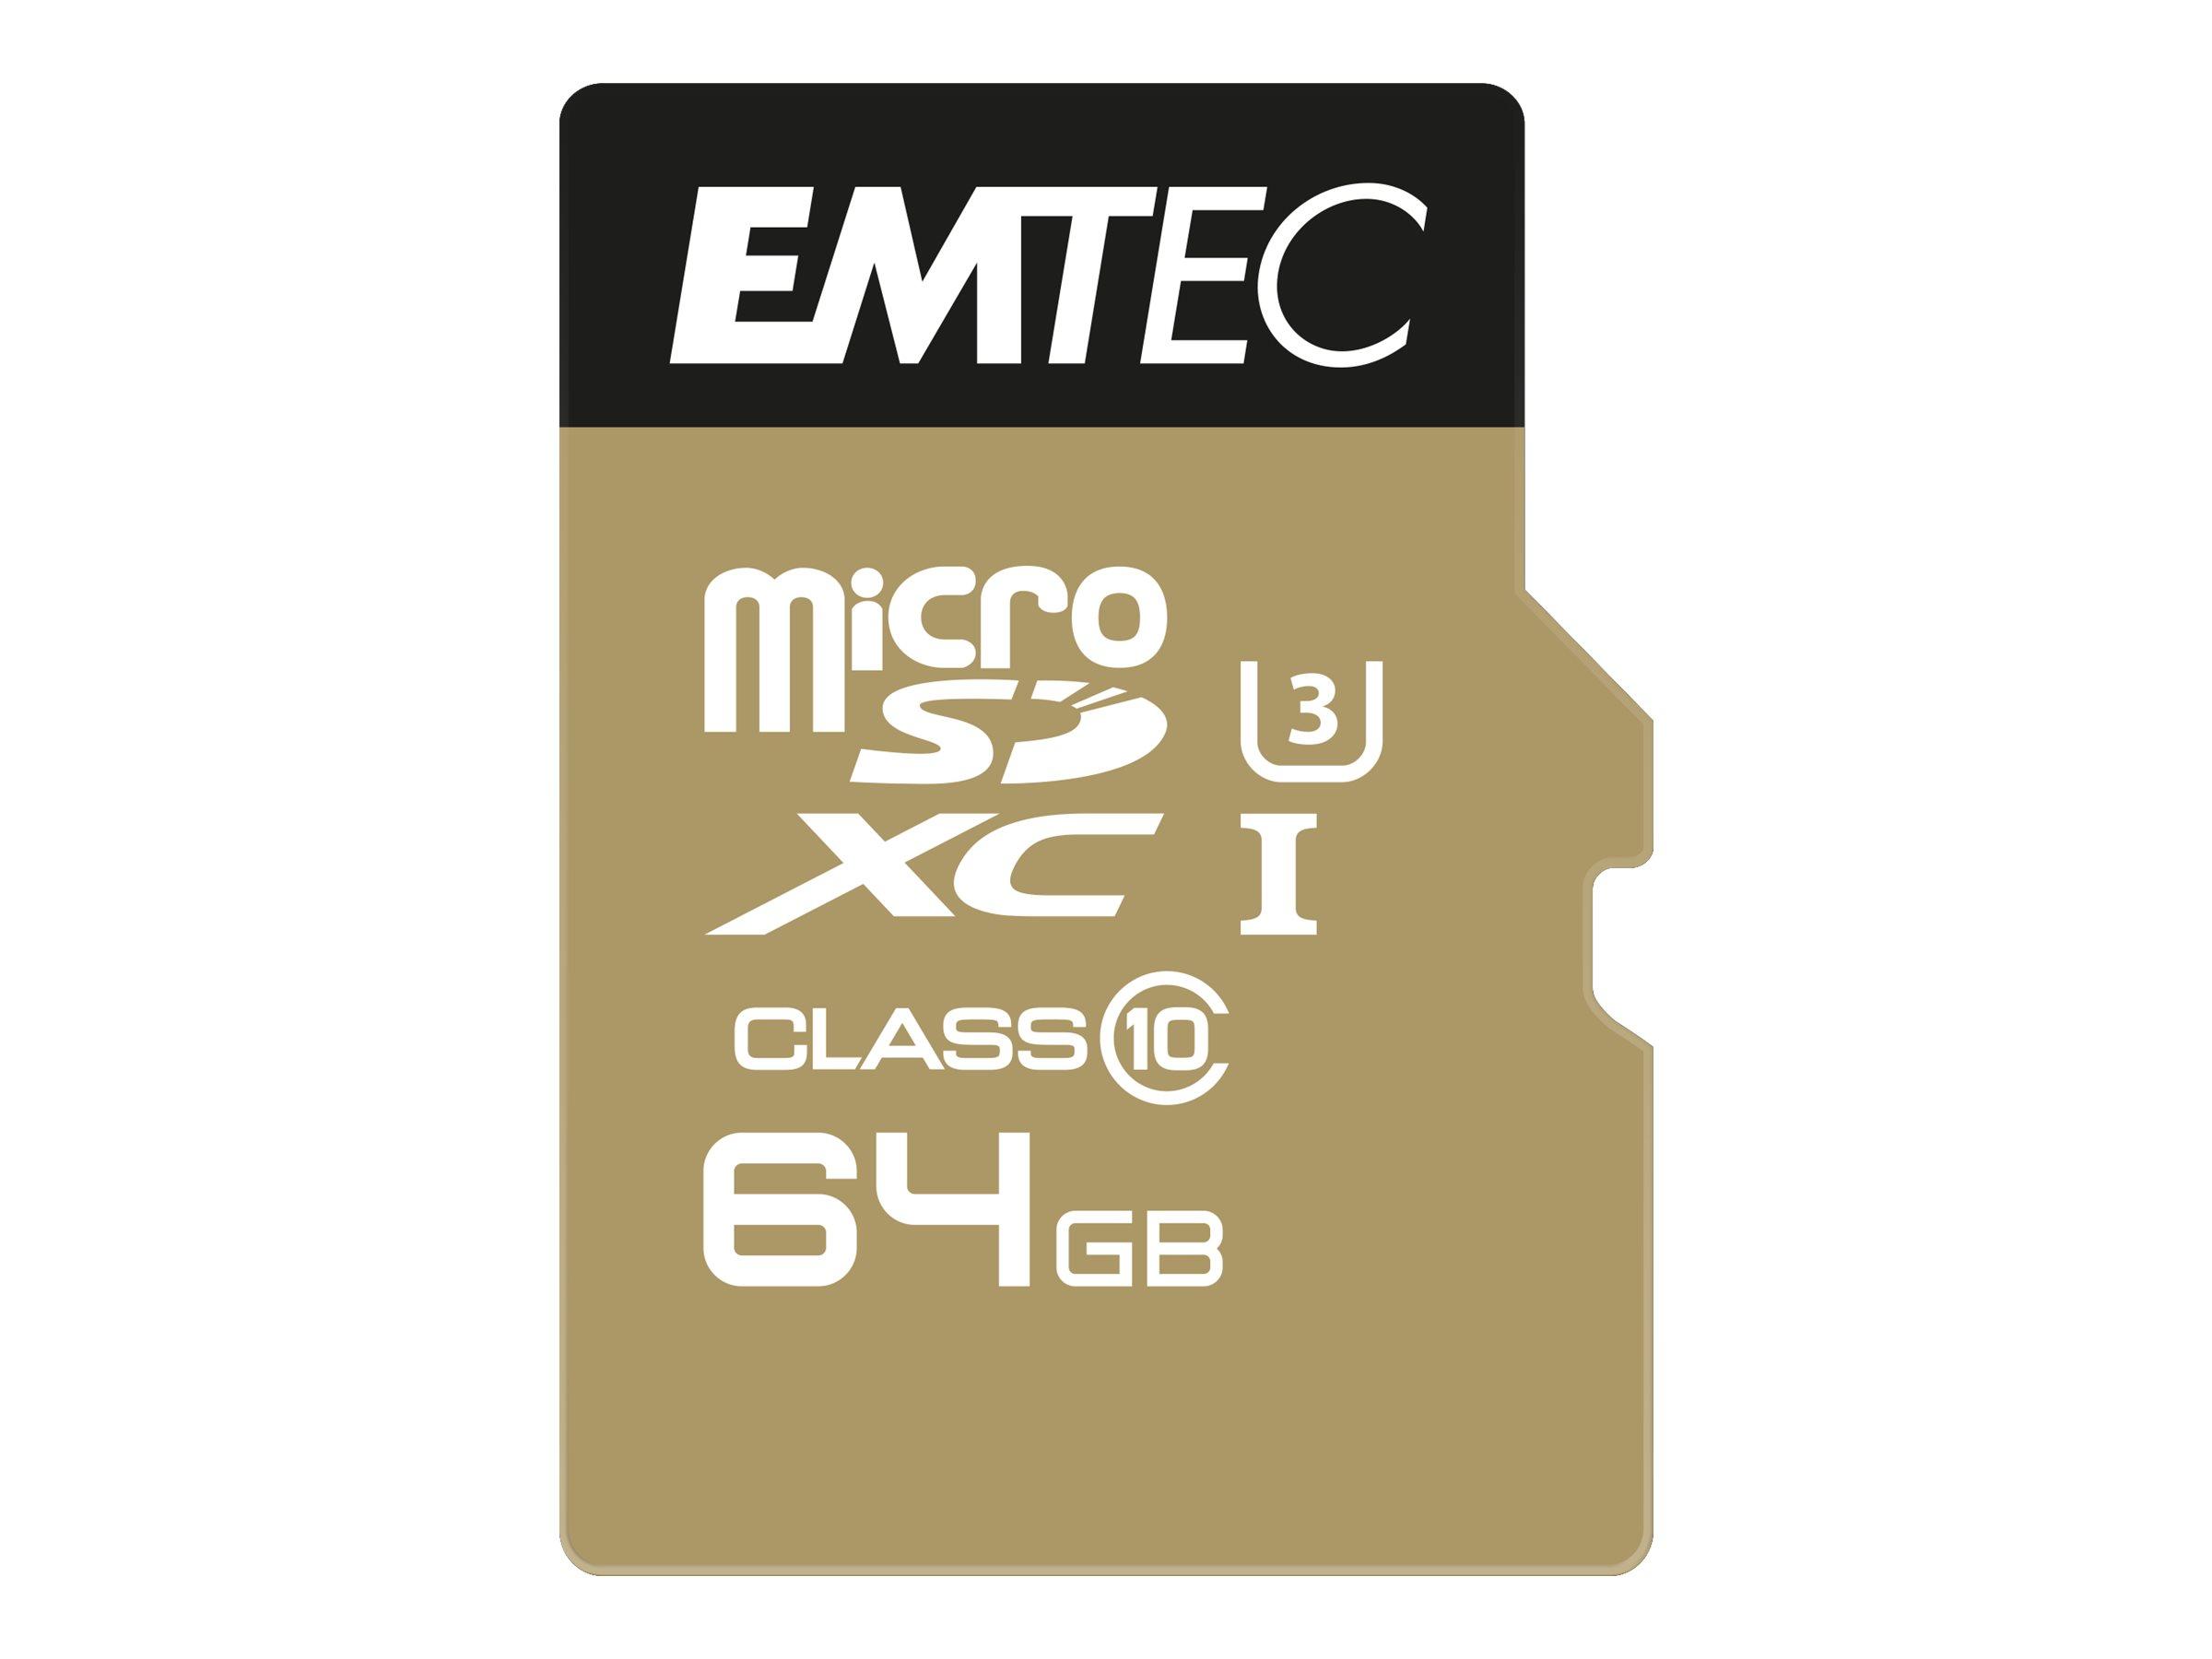 EMTEC SpeedIN' - Flash-Speicherkarte (microSDXC-an-SD-Adapter inbegriffen)